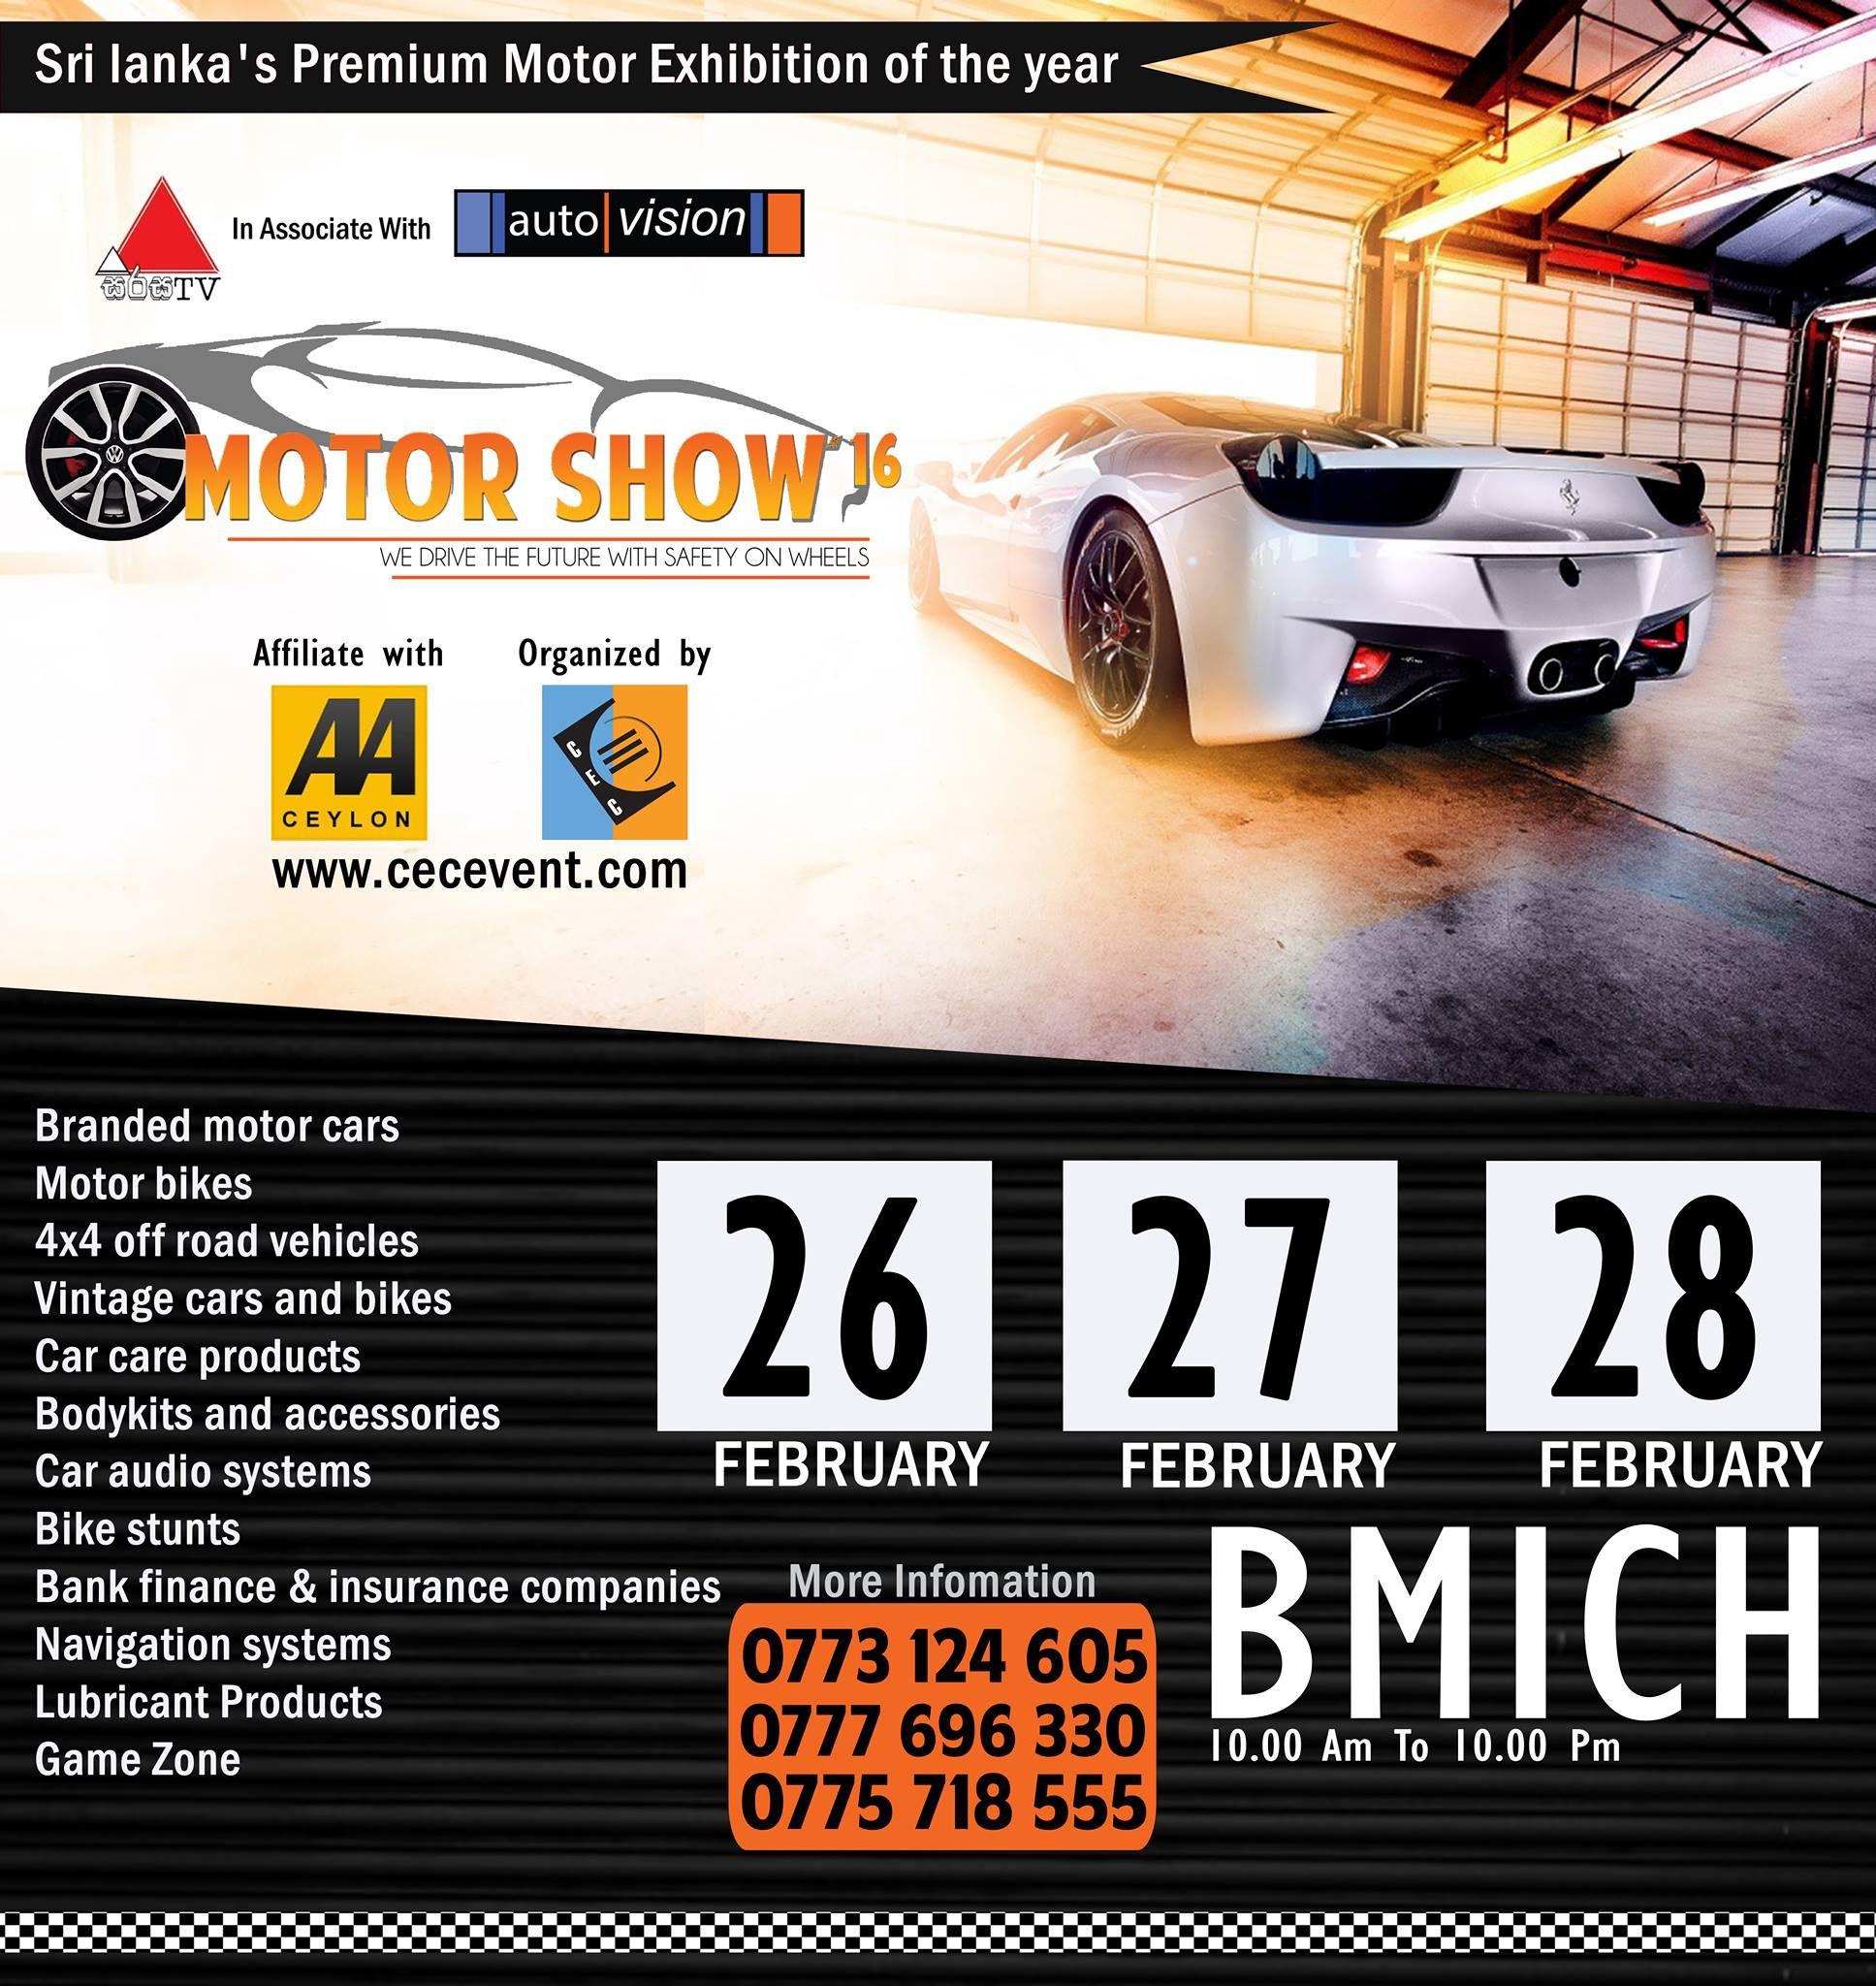 Sirasa Tv Sirasa Auto Vision Motor Show 2016 Motor Vintage